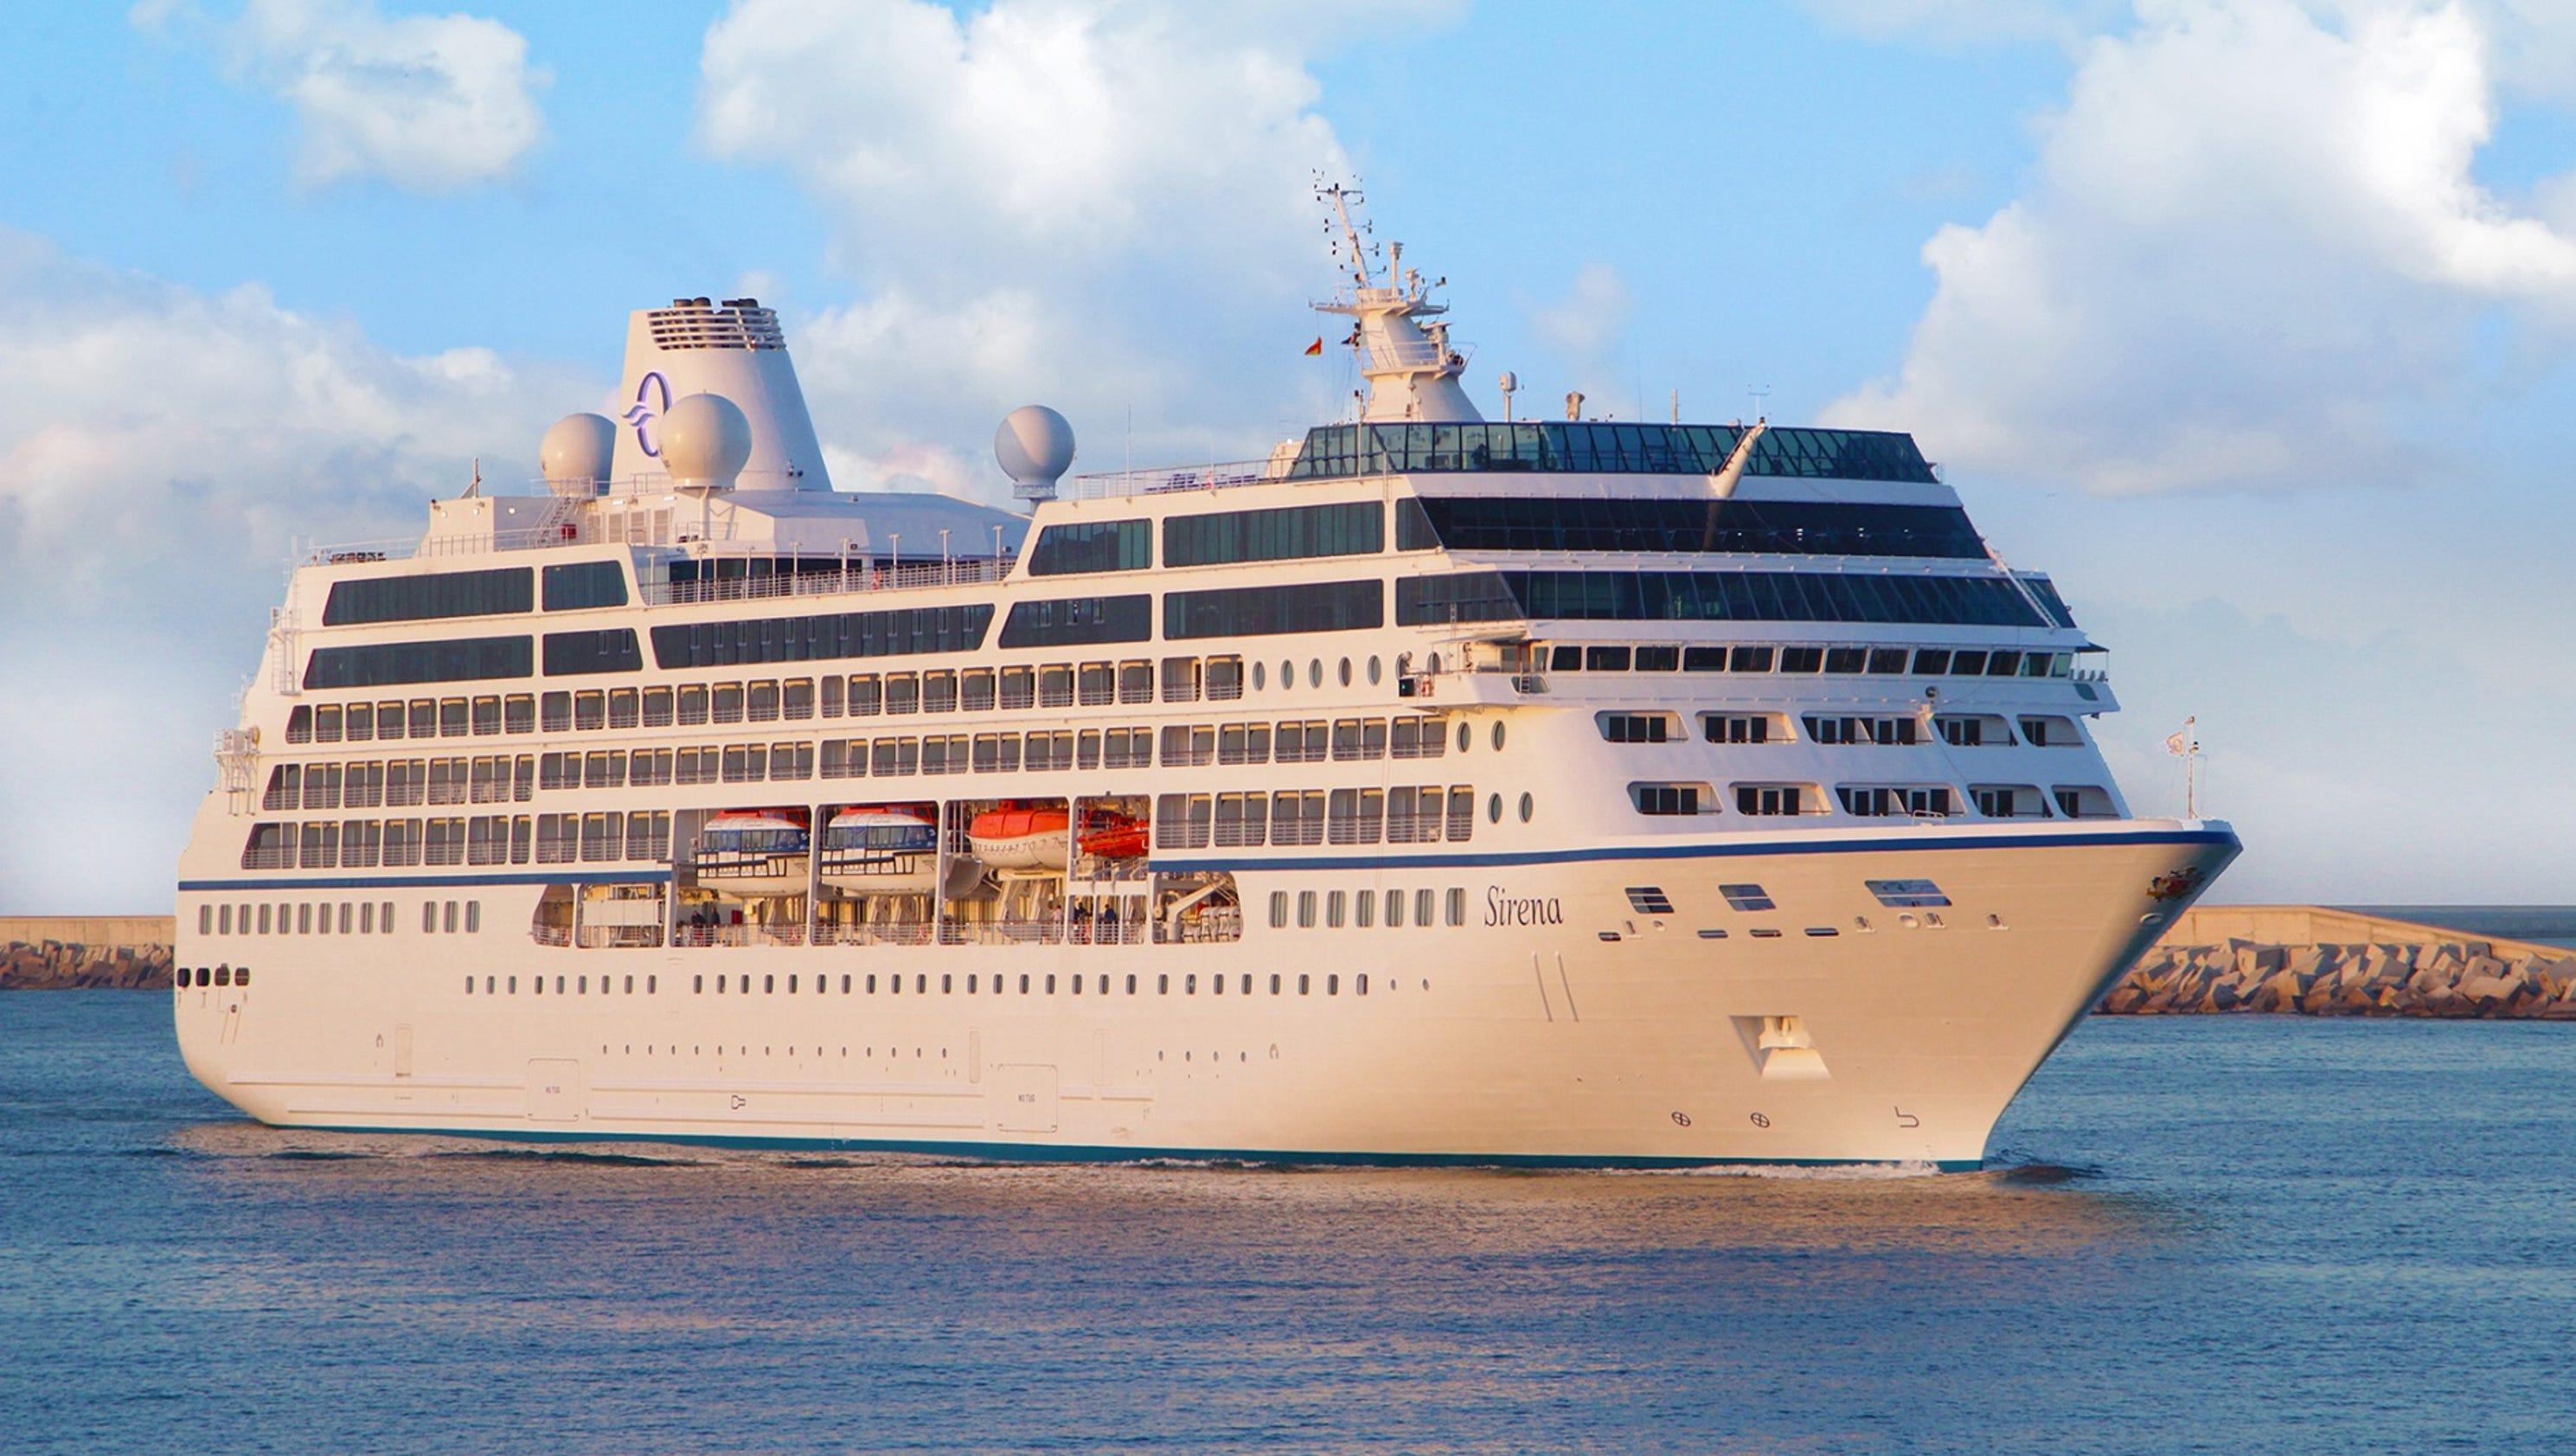 Cruise ship tours: Oceania Cruises' Sirena